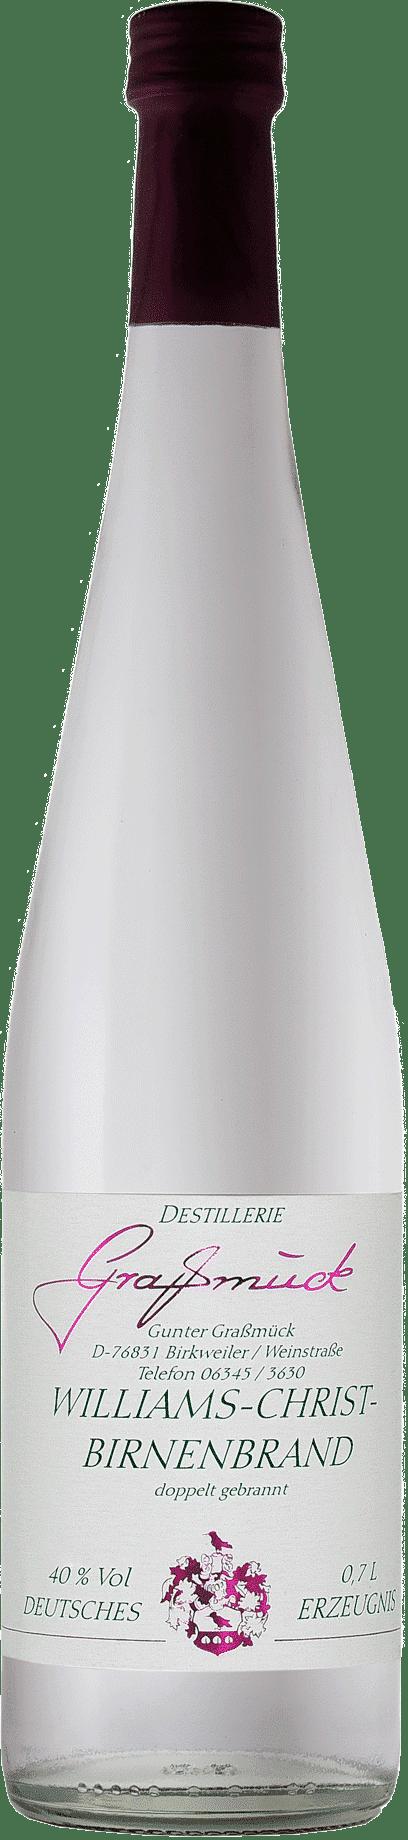 Weingut Ludwig Graßmück, Simon Graßmück, Williams-Christ-Birnenbrand